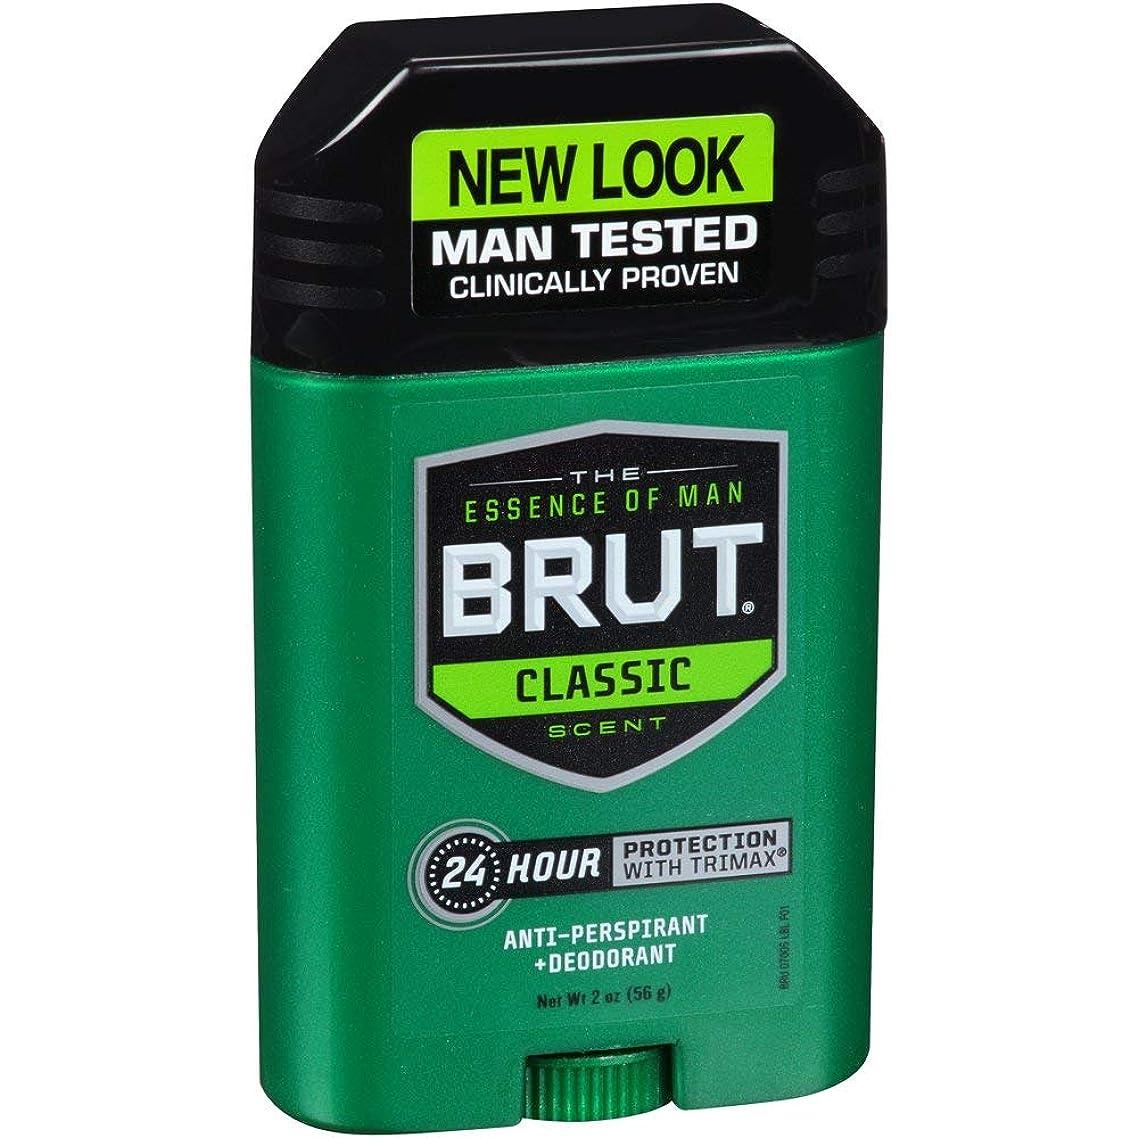 BRUT Anti-Perspirant Deodorant Stick Classic Scent 2 oz (Pack of 3)